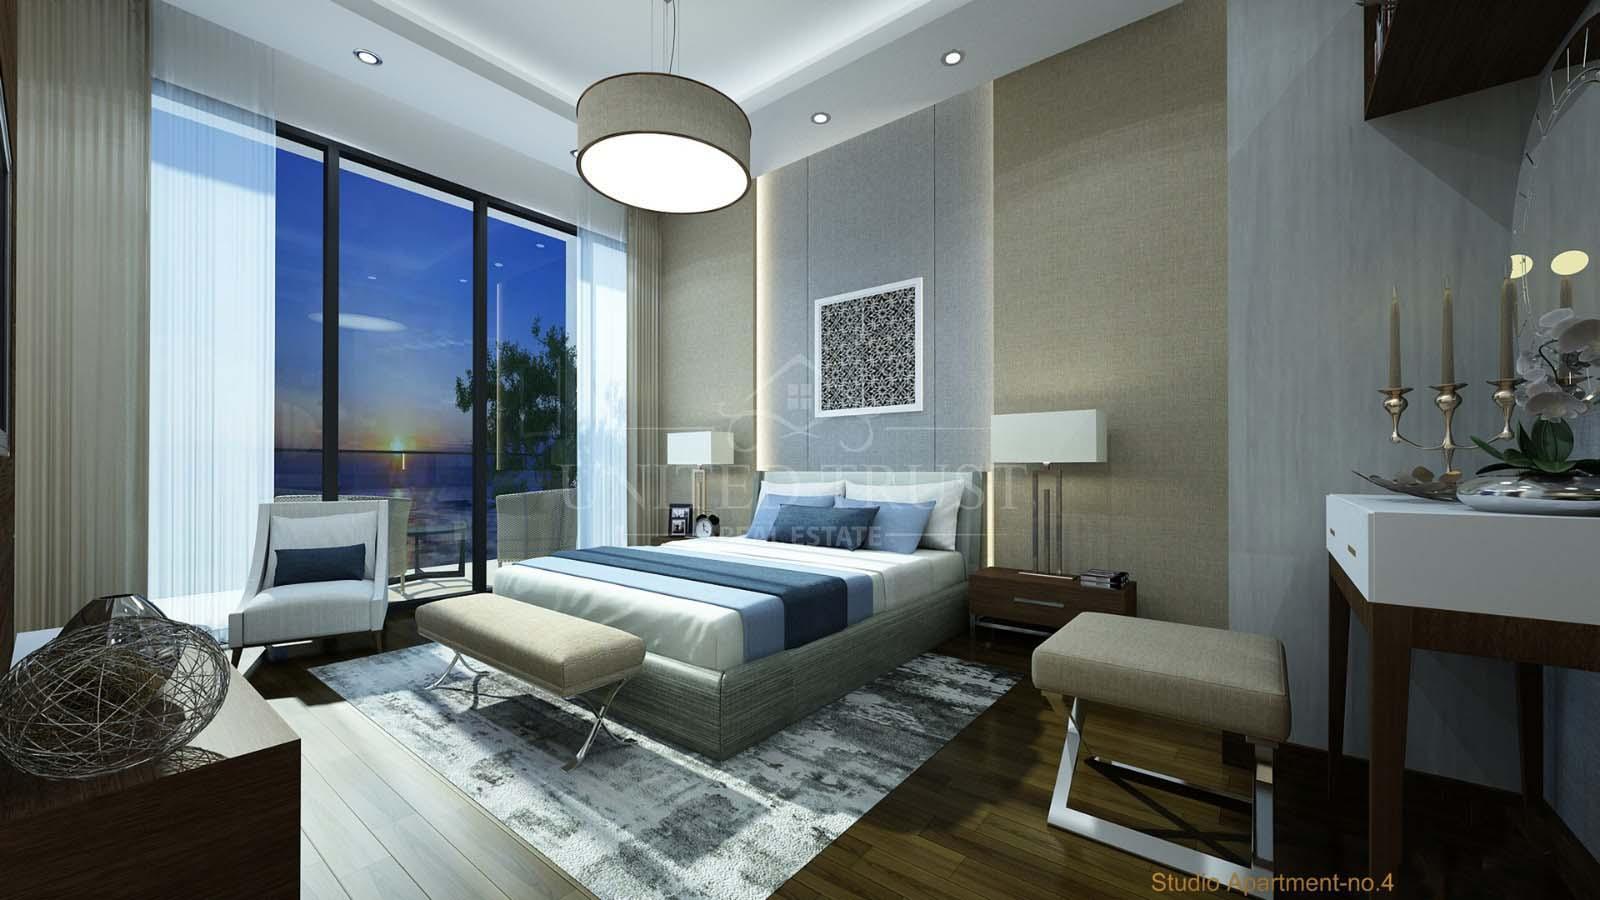 For Sale Brand New Luxury Apartment Ref: JUF-SB-085